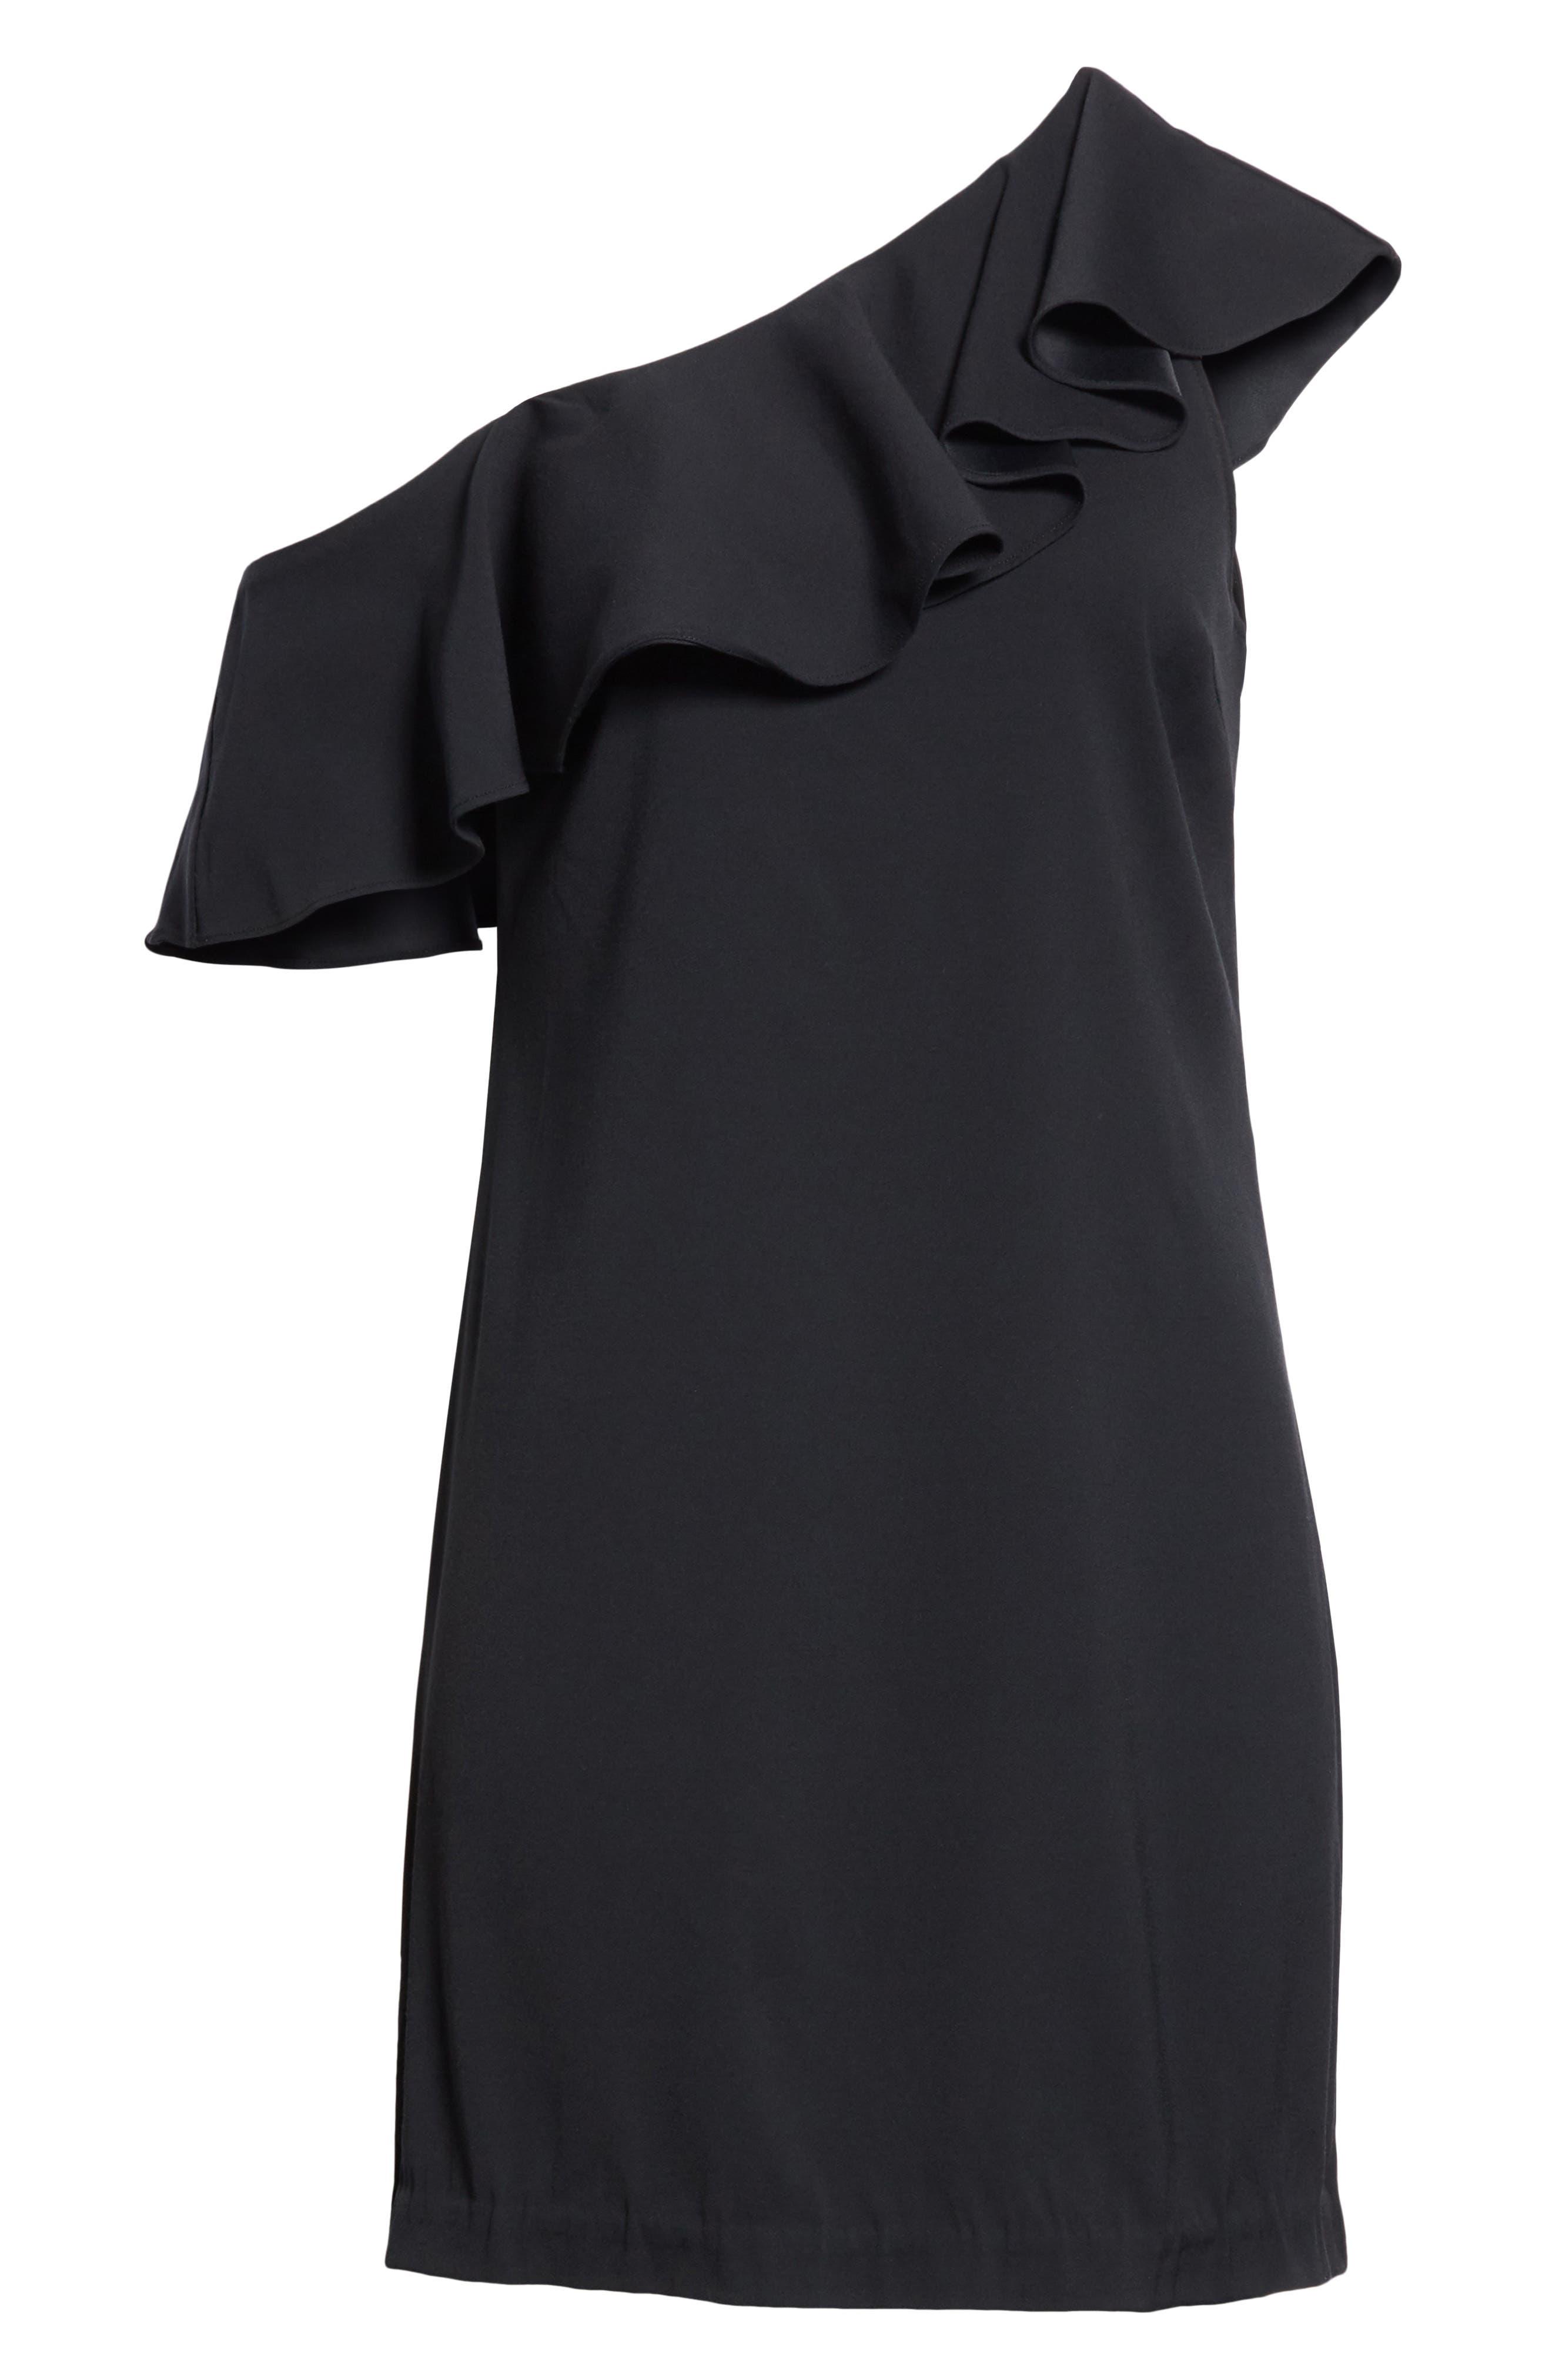 Bronwen Ruffled One-Shoulder Dress,                             Alternate thumbnail 6, color,                             001